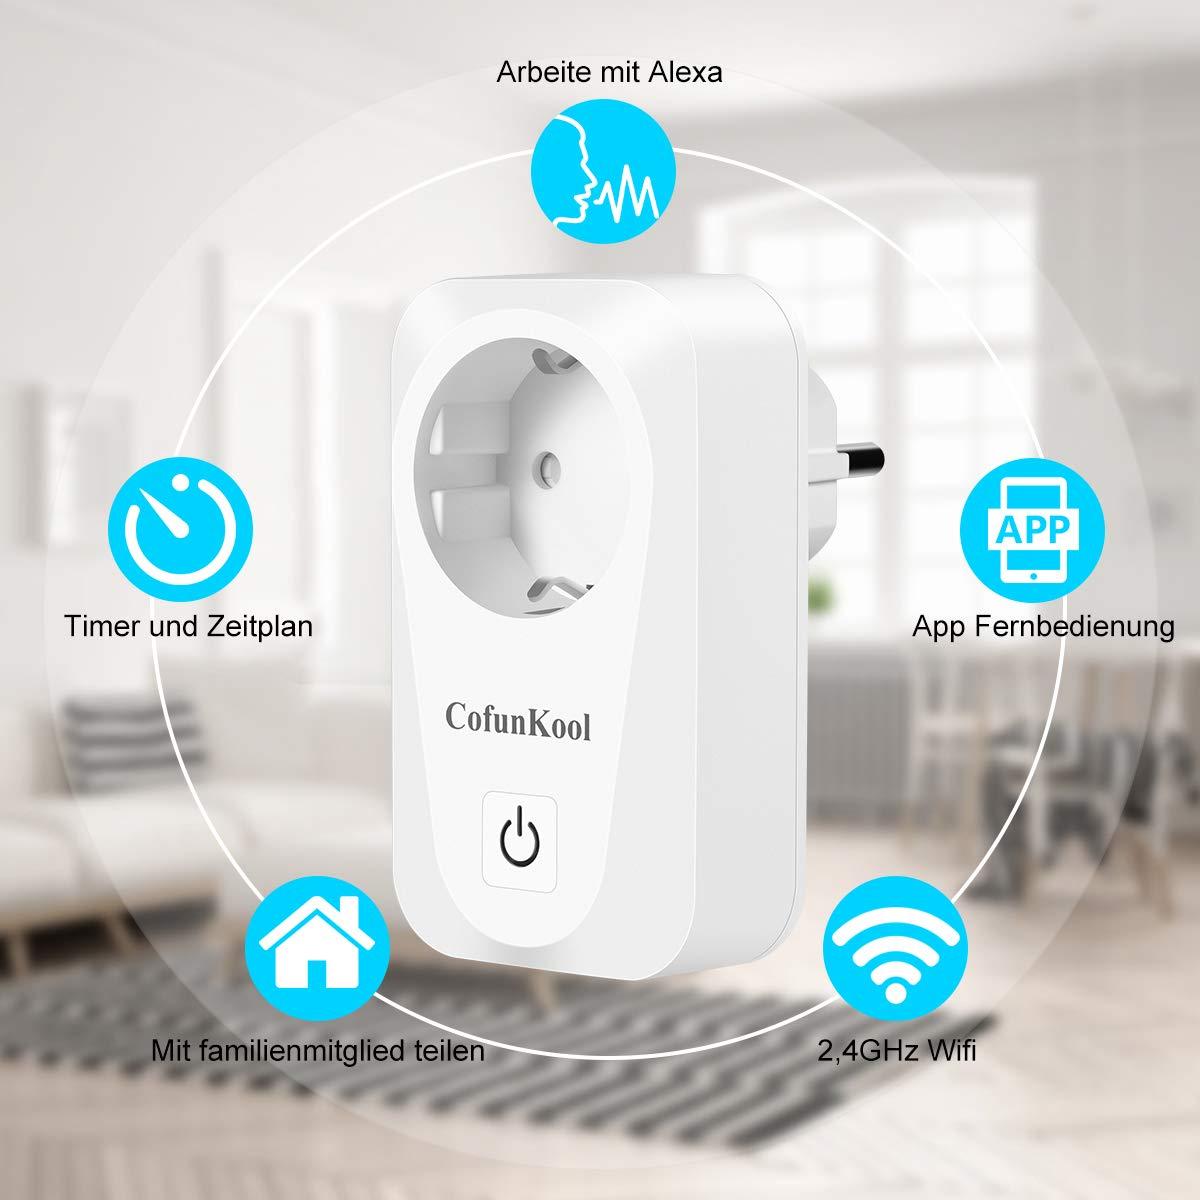 Smart Steckdose CofunKool Intelligente Wifi Steckdose mit Google home und Amazon Alexa (Echo und Echo Dot) Fernbedienung Plug 16A